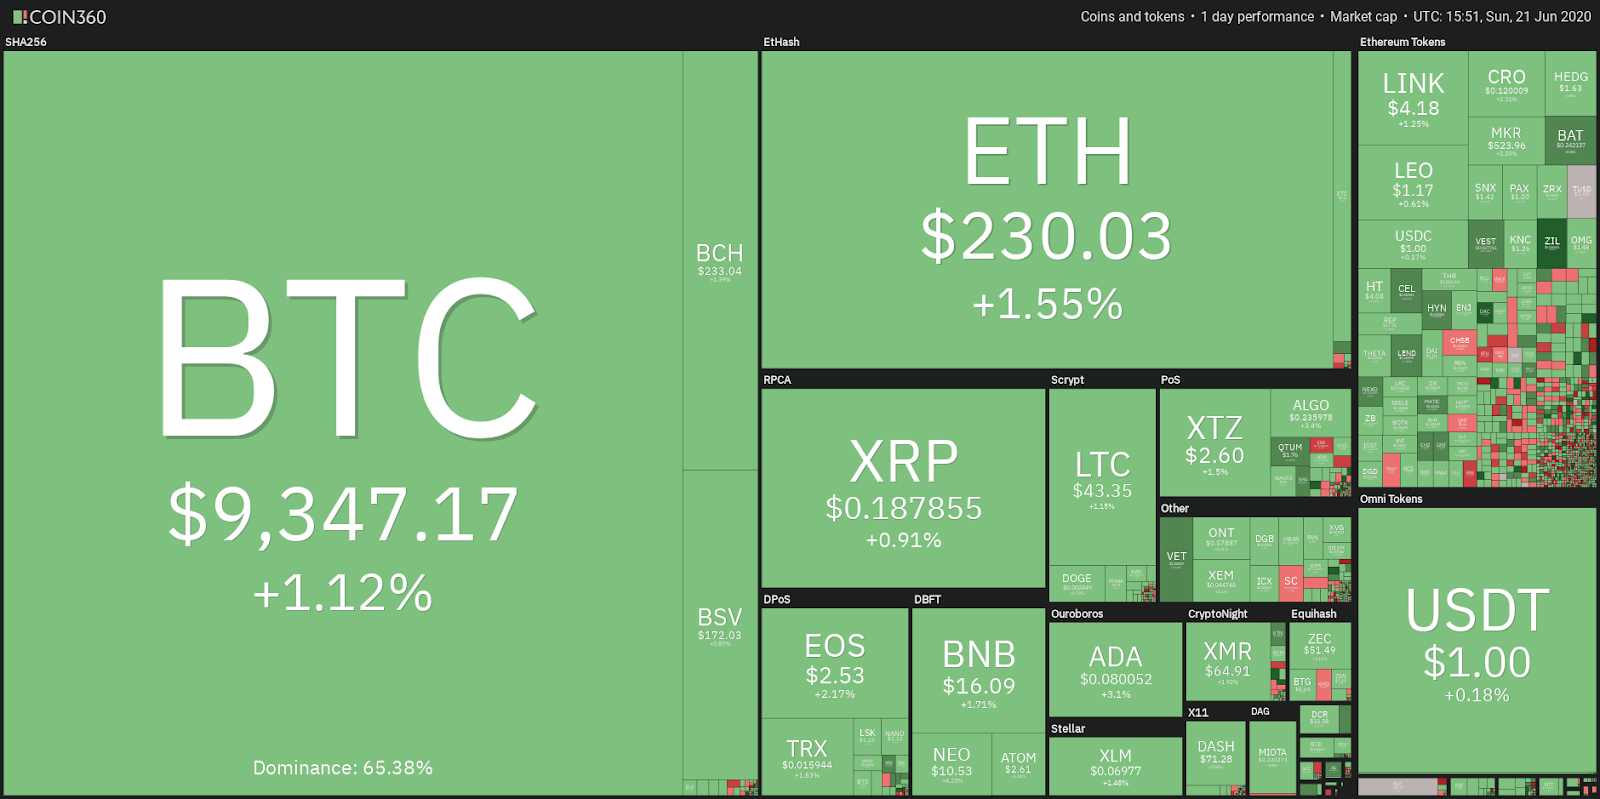 Top 5 Cryptocurrencies to Watch This Week: BTC, ETH, ADA, LEO, XMR